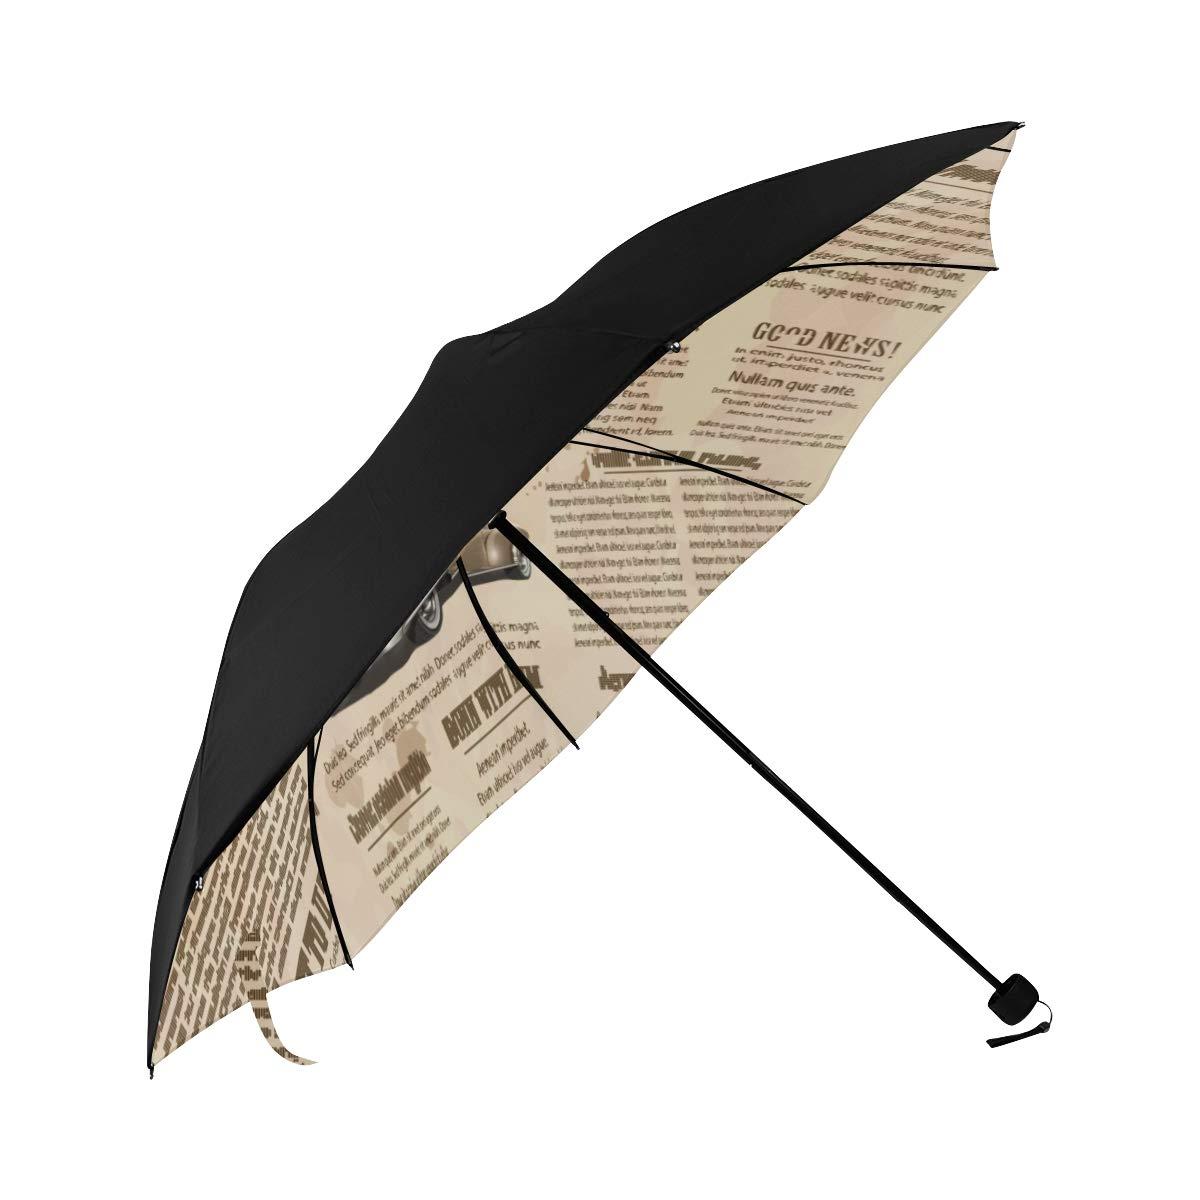 New York Newspaper Vintage Sheepskin Roll English News Design Fashion Compact Travel Umbrella Parasol Anti Uv Foldable Umbrellas(underside Printing) As Best Present For Women Uv Protection